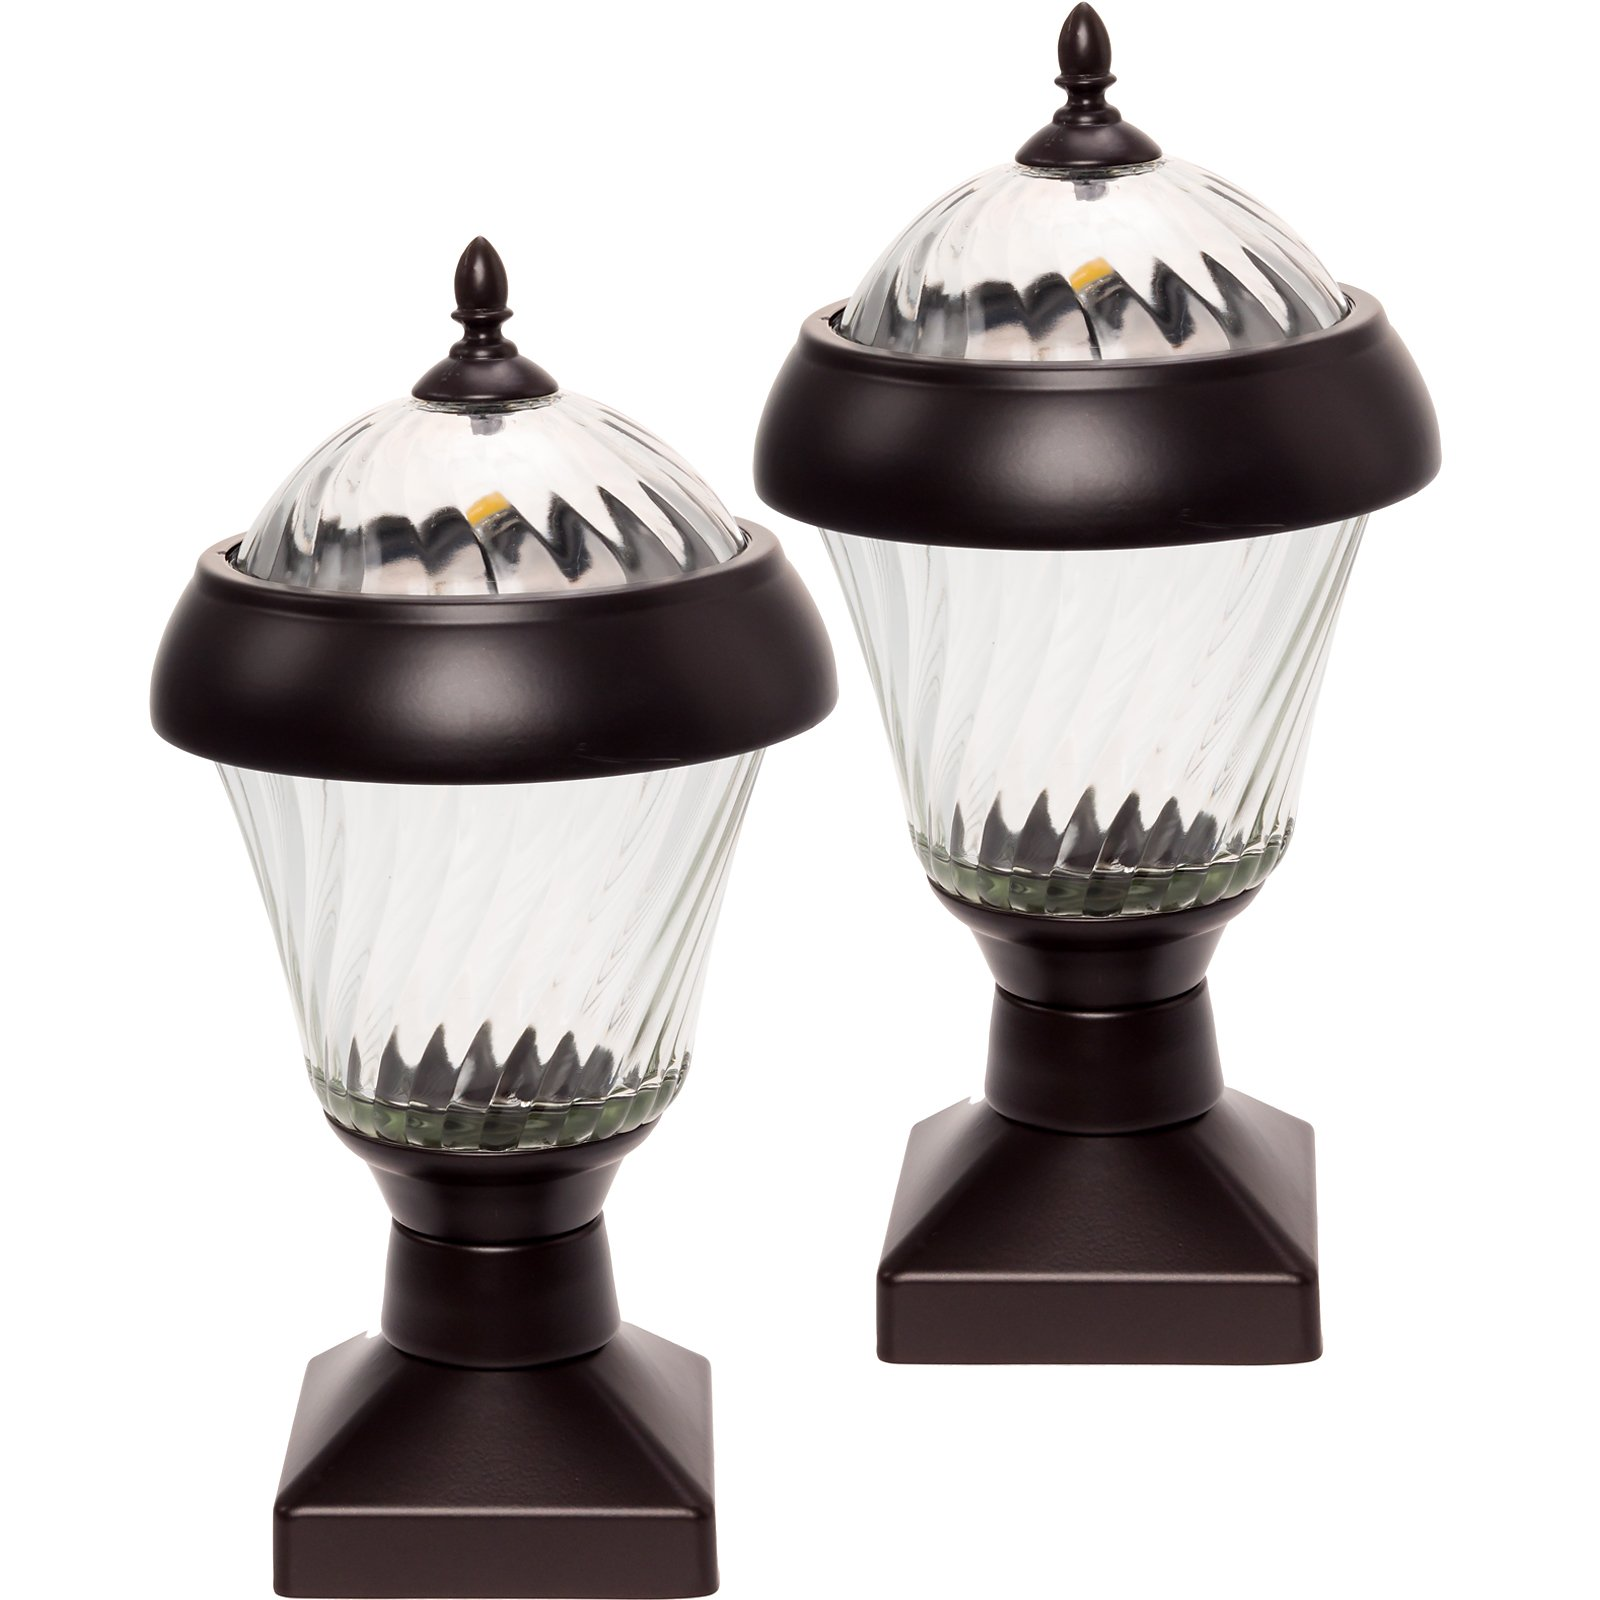 2 Pack GreenLighting Bahama 20 Lumen High End Solar Post Cap Lights for 4x4 Wood Posts (Remington Bronze)